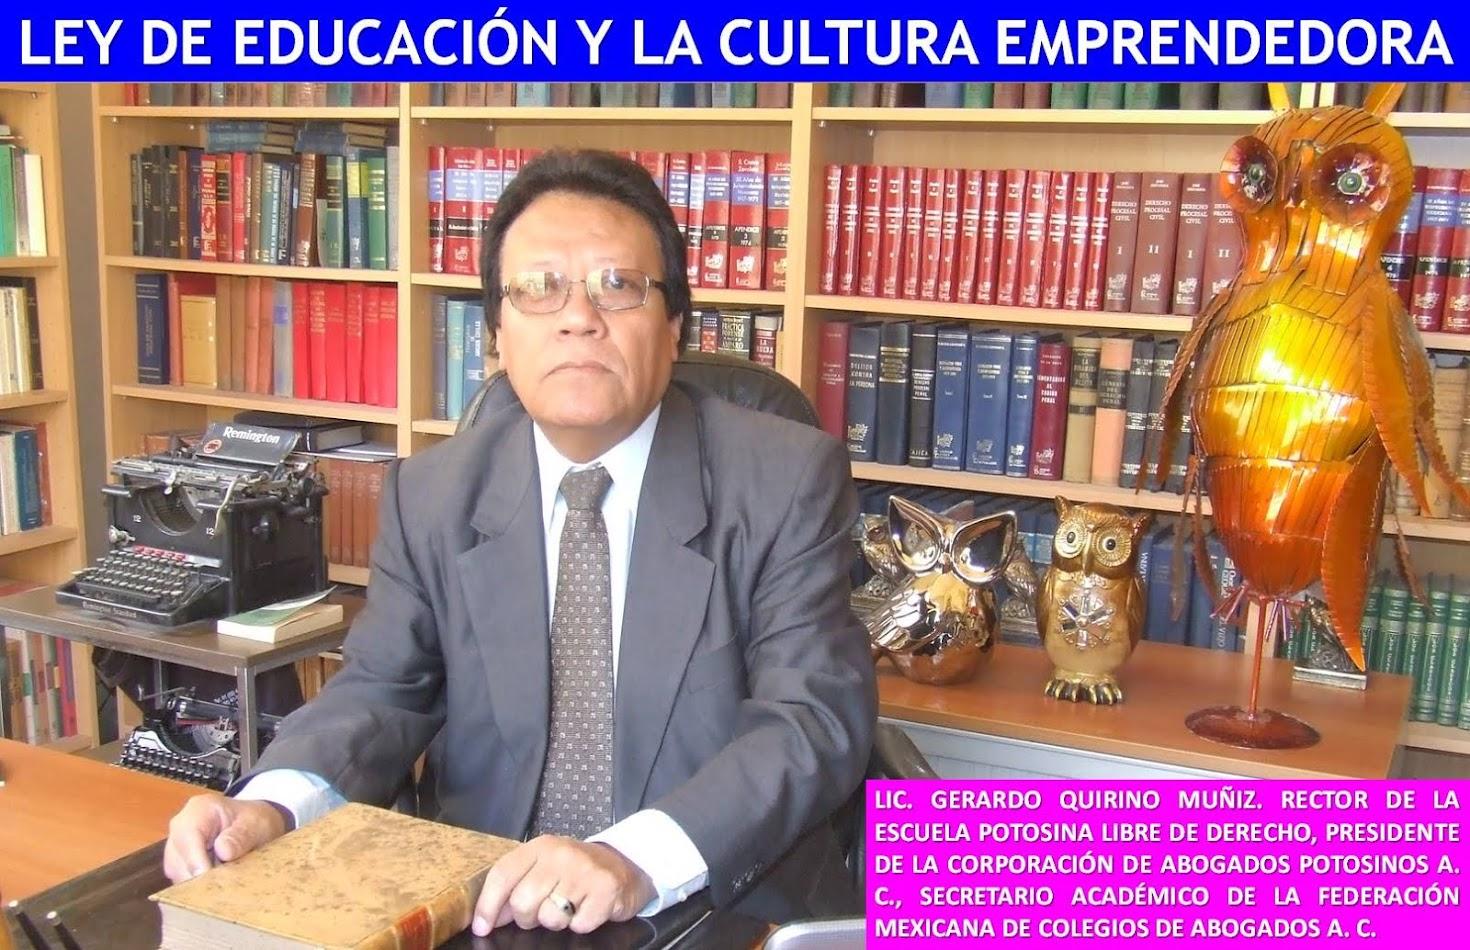 EDITORIAL DEL LIC. GERARDO QUIRINO MUÑOZ.